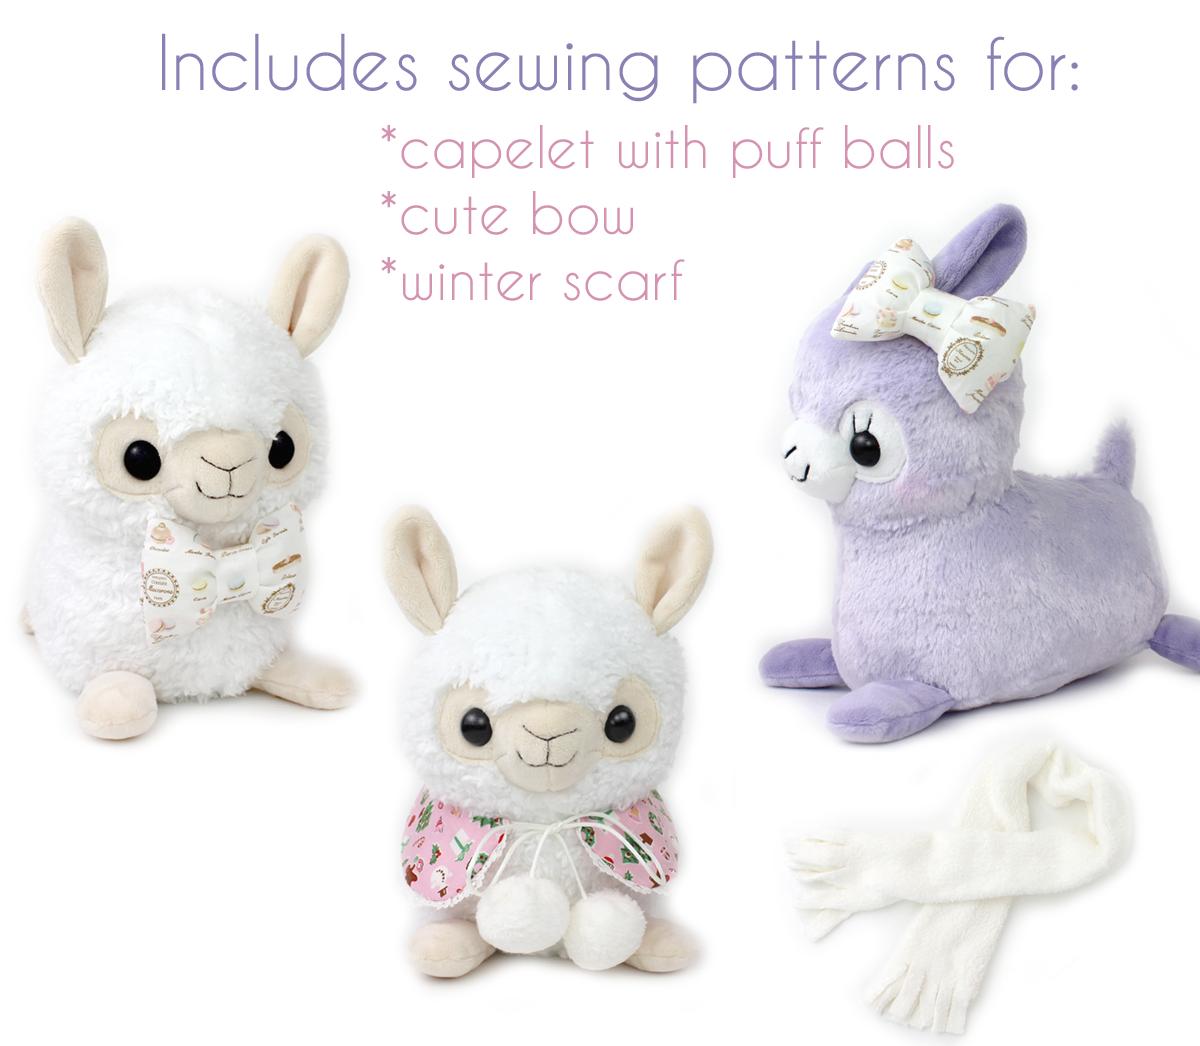 alpaca-sewing-pattern-by-teacuplion-accessories2 | Jenna - crafts ...